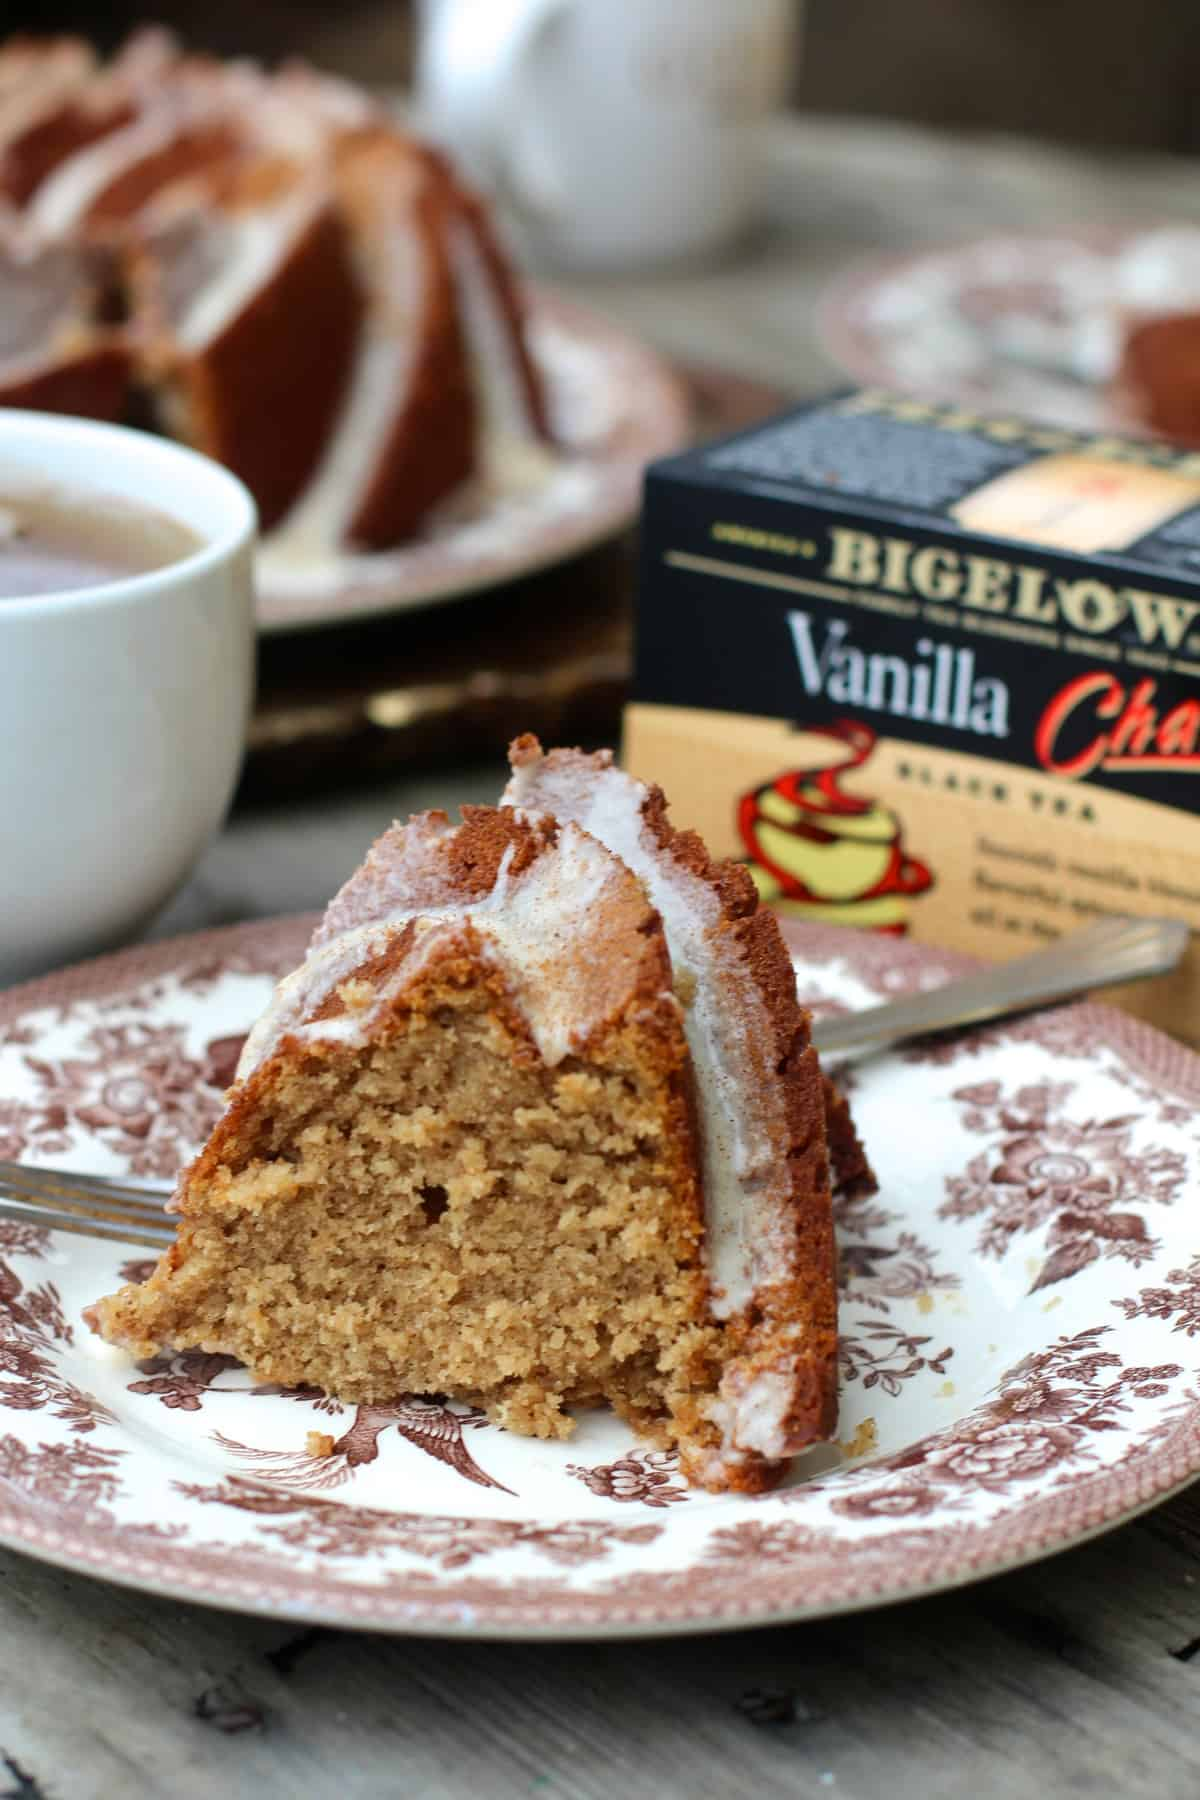 Bigelow Tea Vanilla Chai Bundt Cake